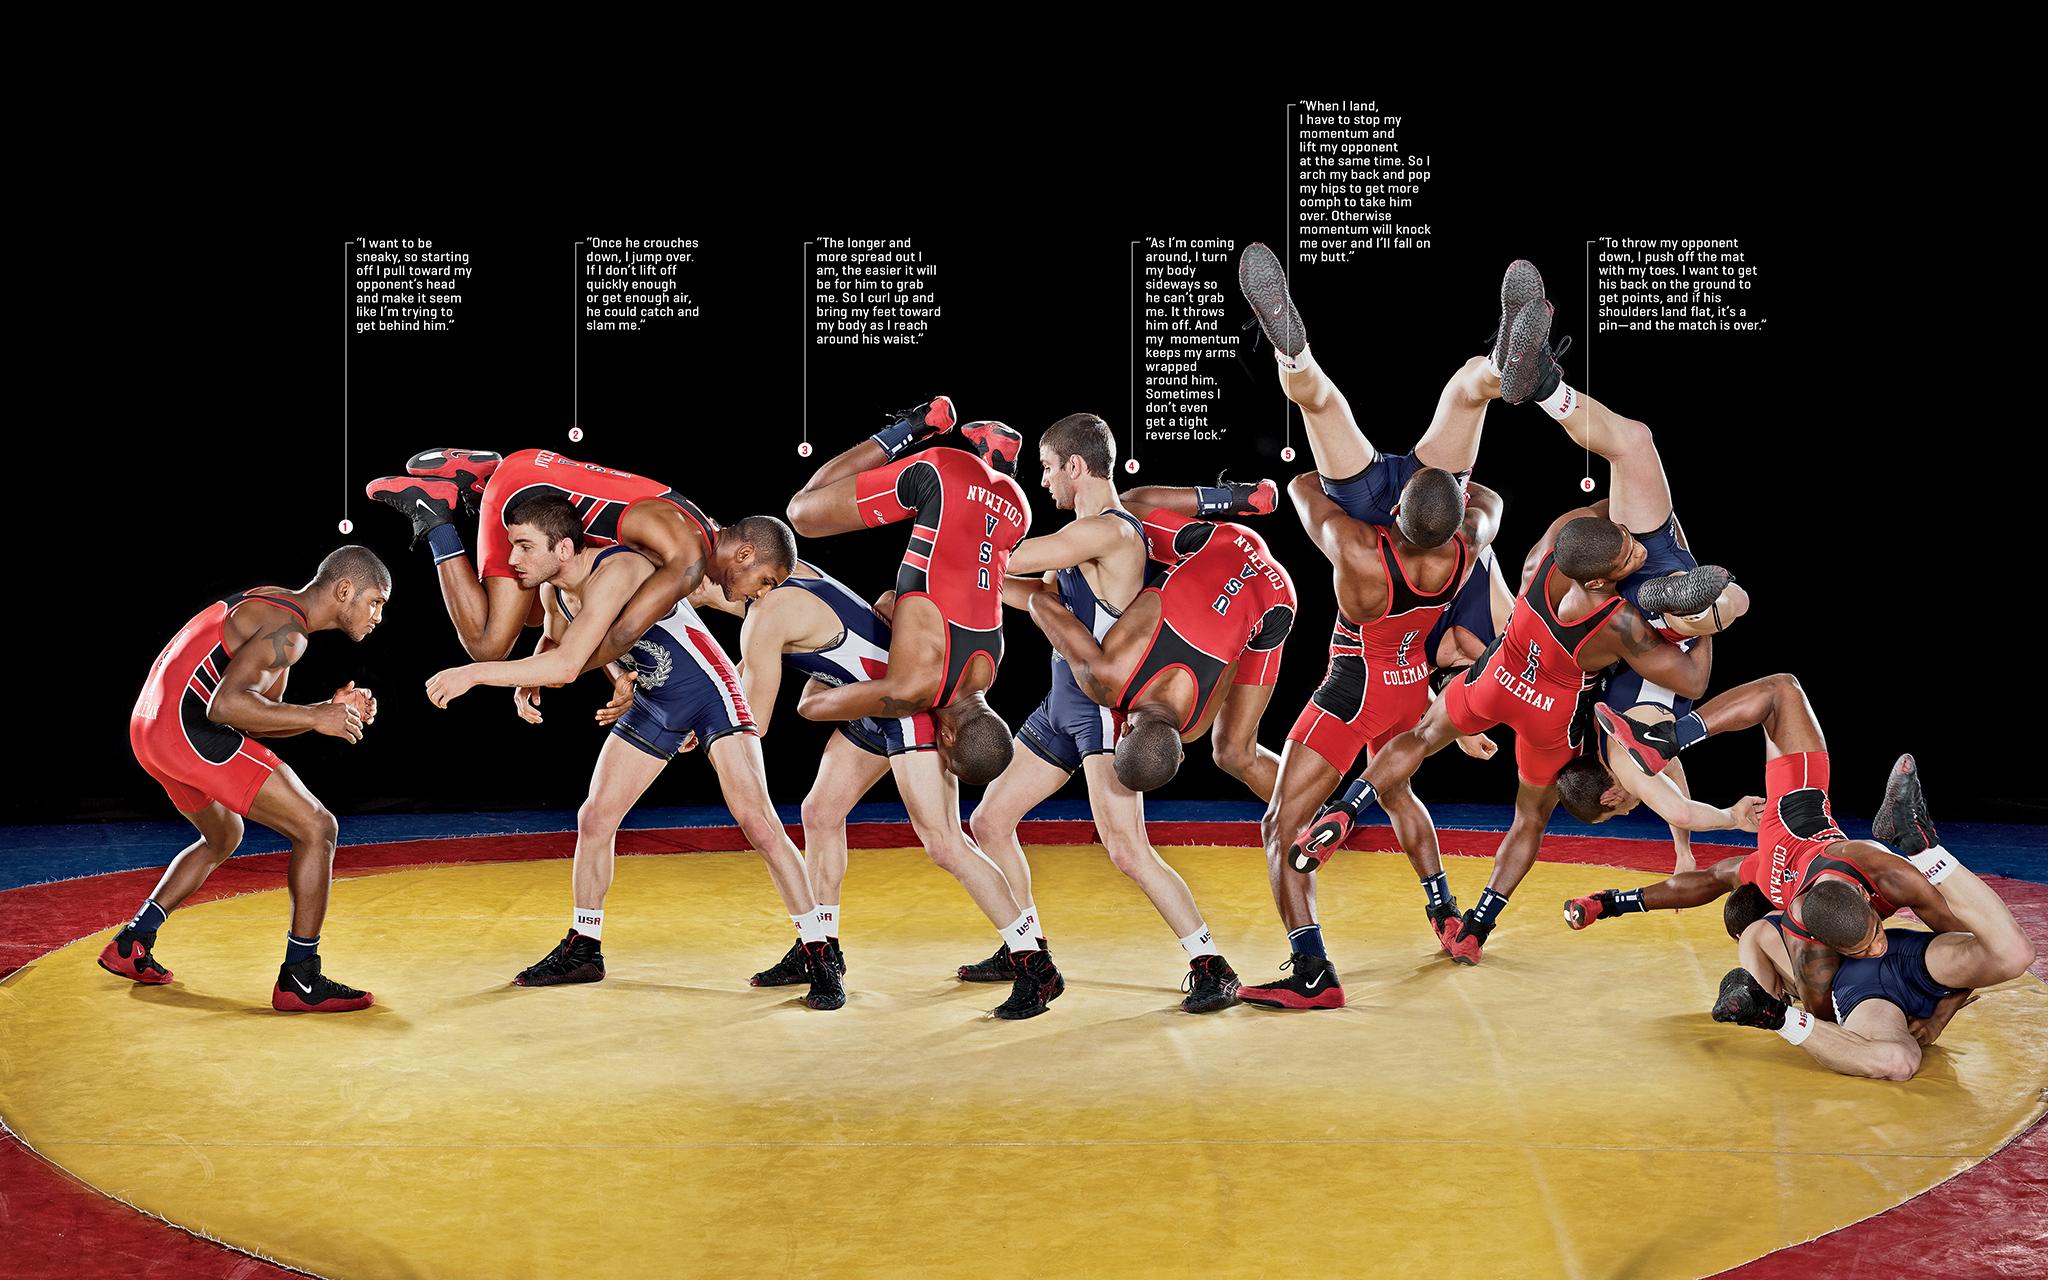 Ellis Coleman U S Olympic Wrestler So Crazy It Just